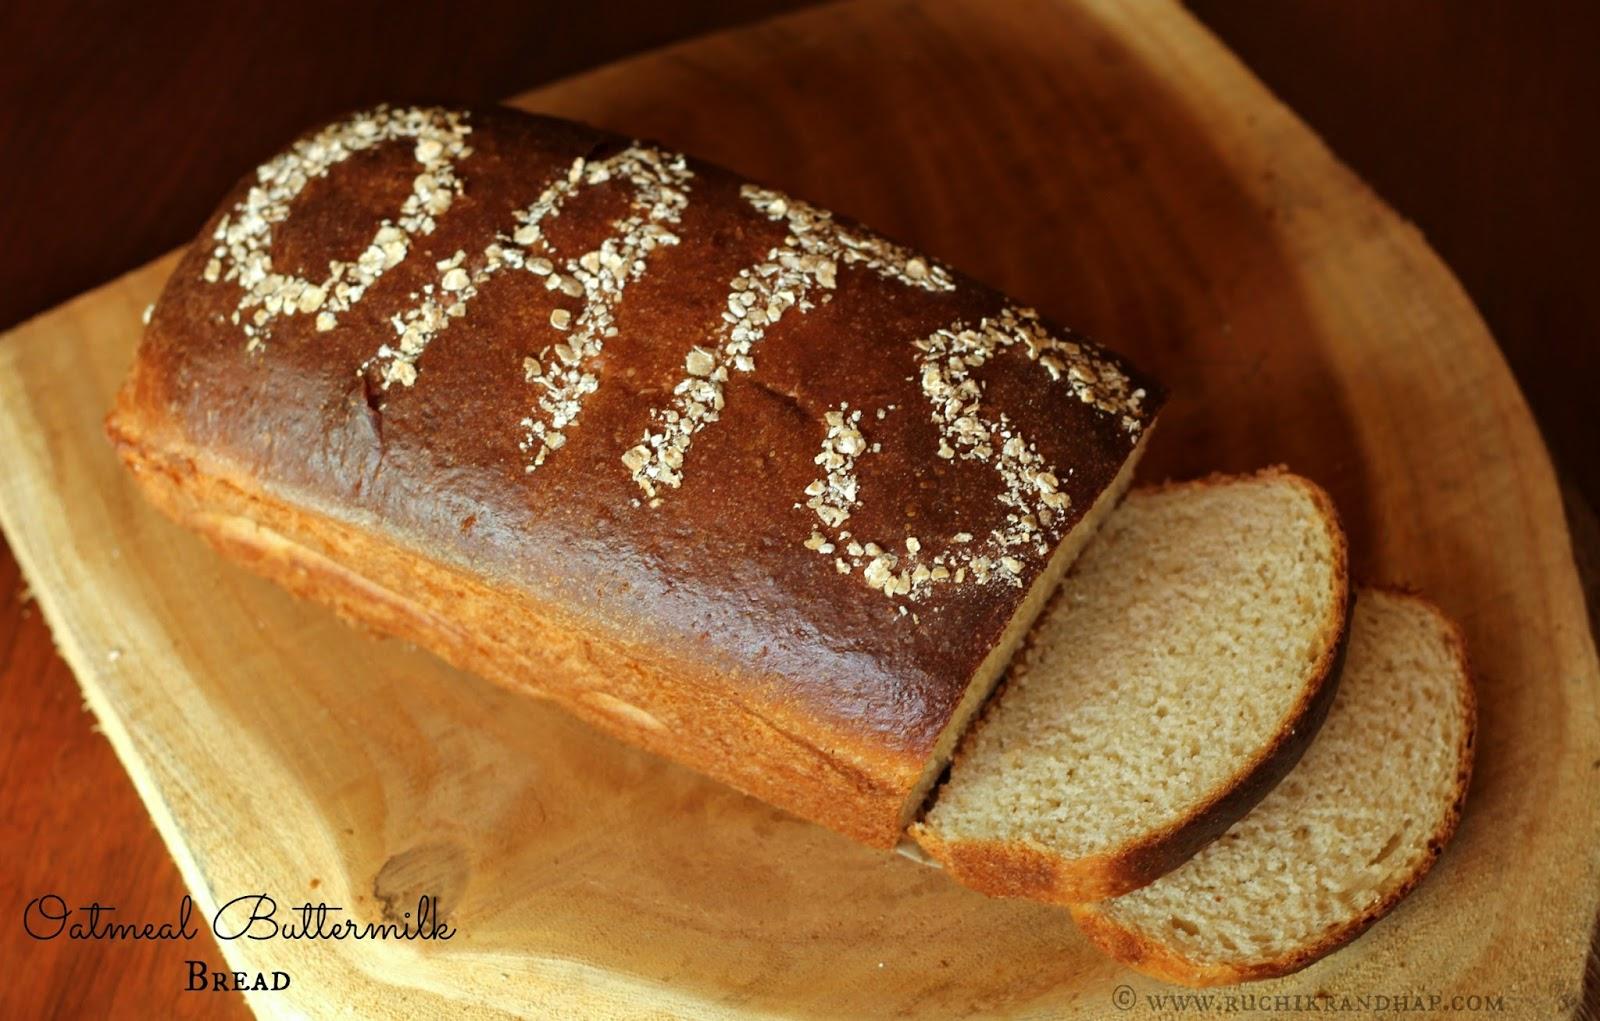 ... Randhap (Delicious Cooking): Oatmeal Buttermilk Bread #Breadbakers